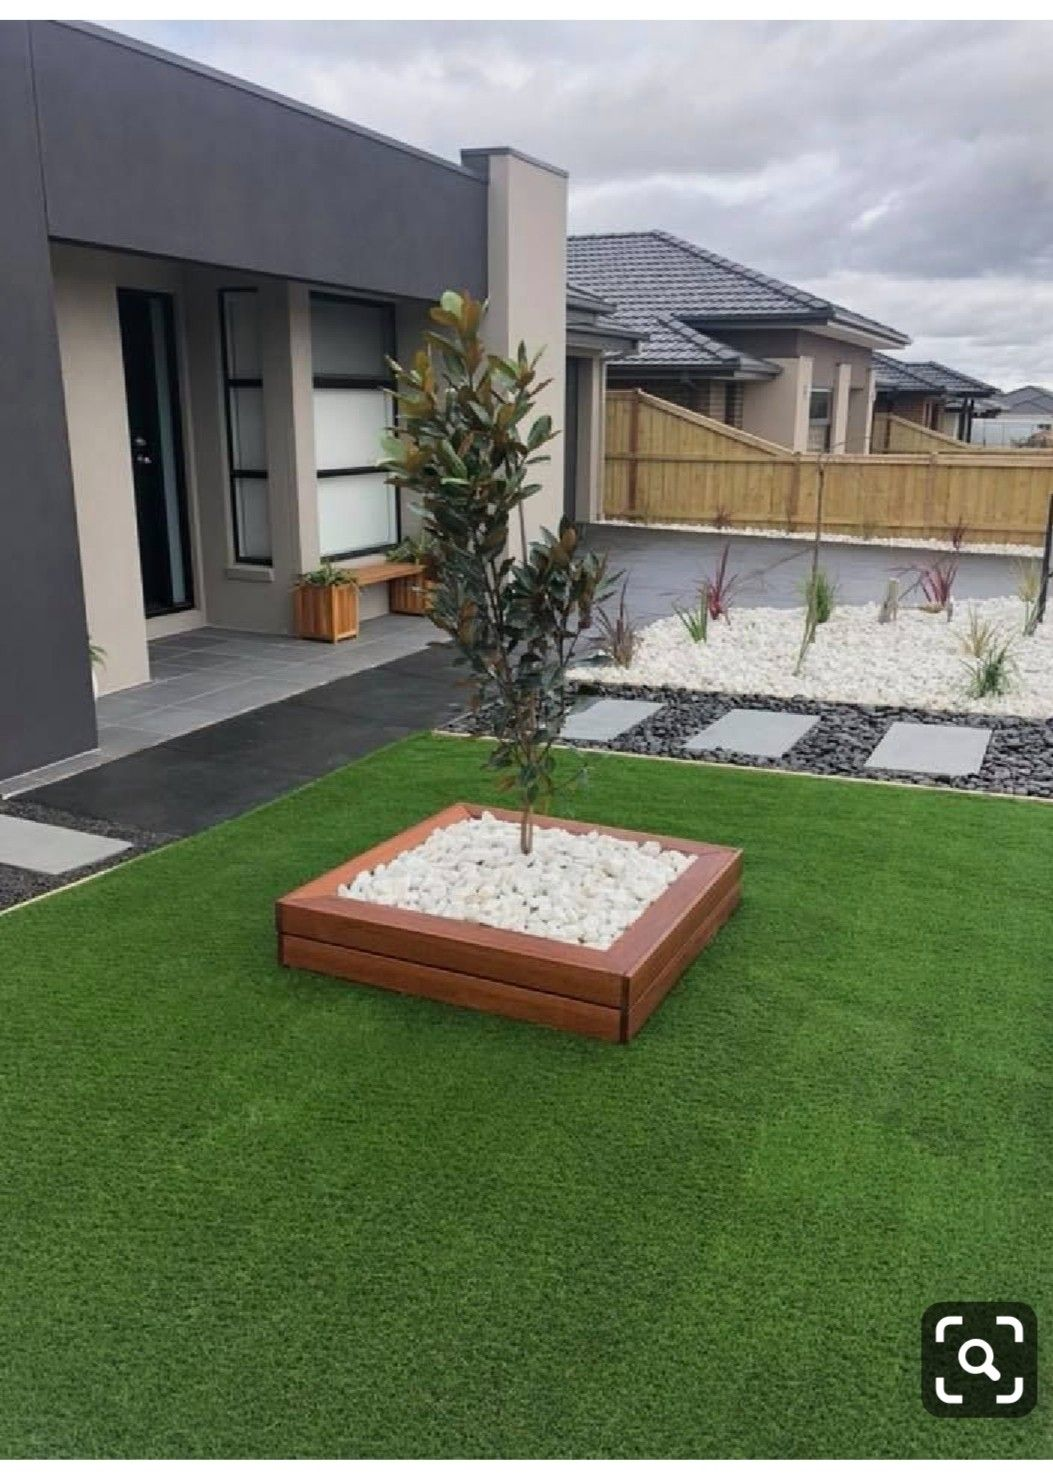 Pin By Sil Via On Yard Ideas Small Backyard Landscaping Front Yard Landscaping Design Small Front Yard Landscaping